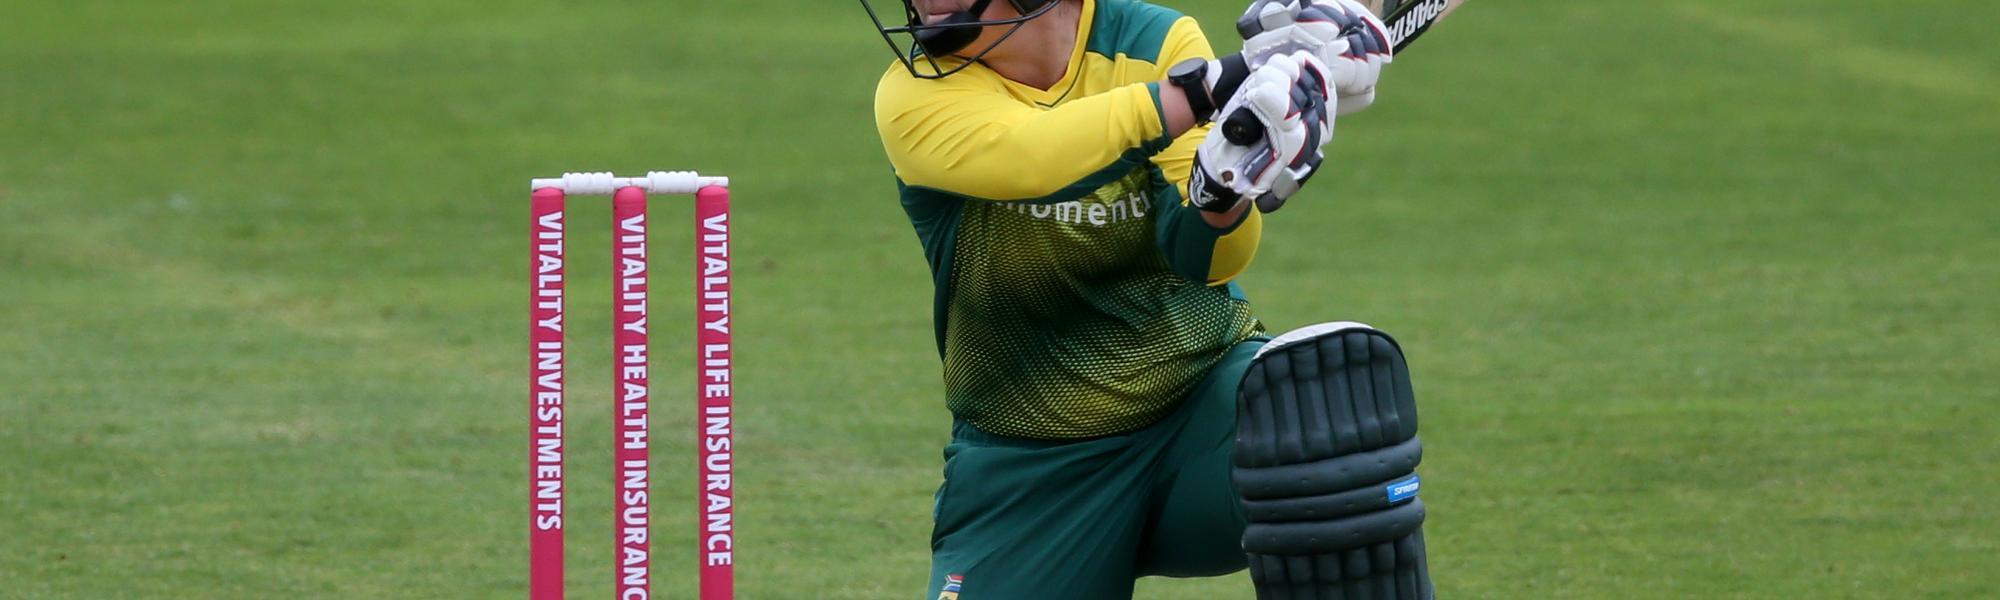 Dane van Niekerk blamed the bowlers for twin losses on the same day